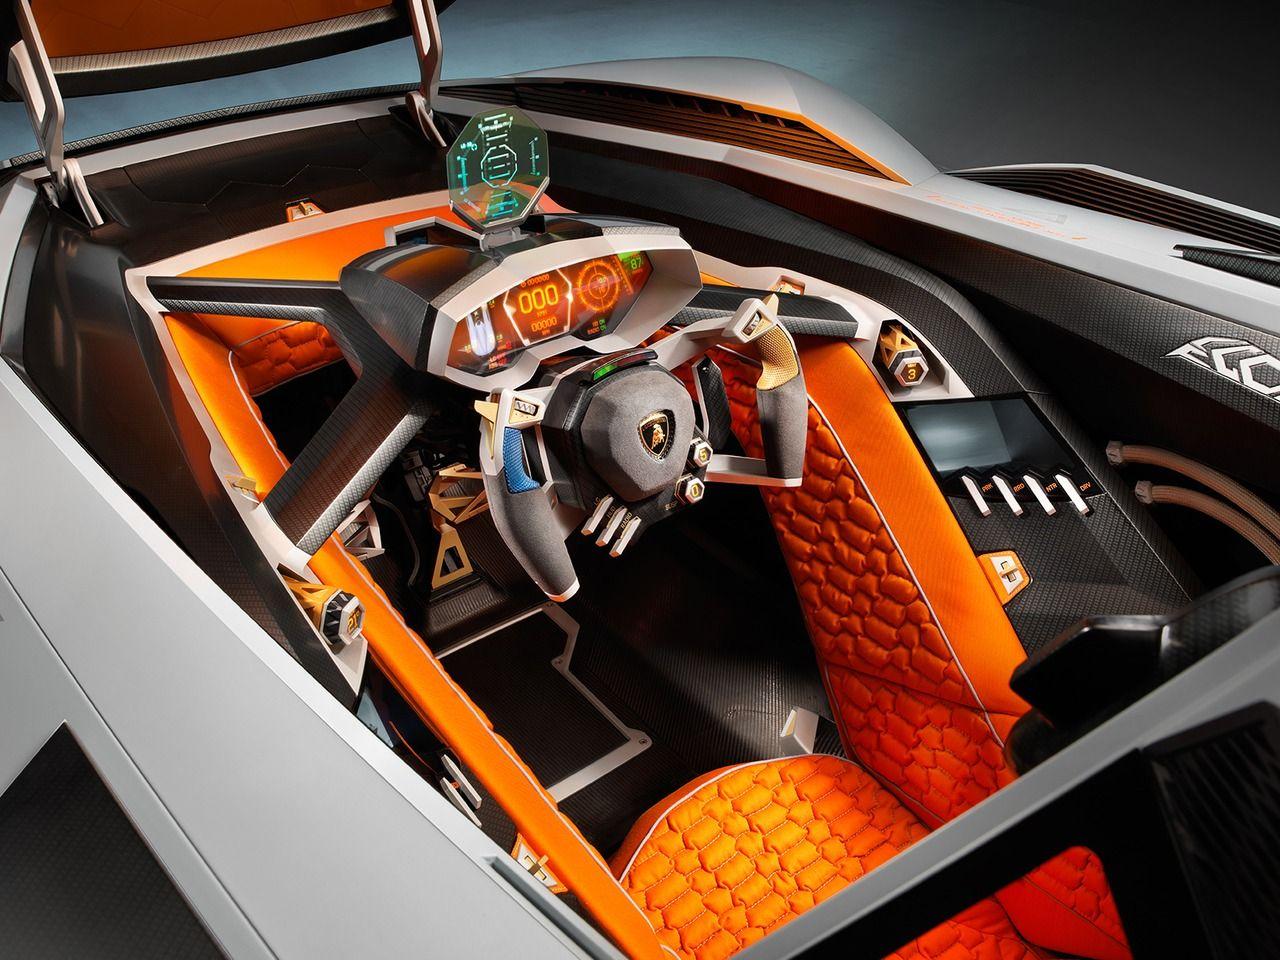 Captivating Car Pictures · The 2013 Single Seater Lamborghini Egoista Concept